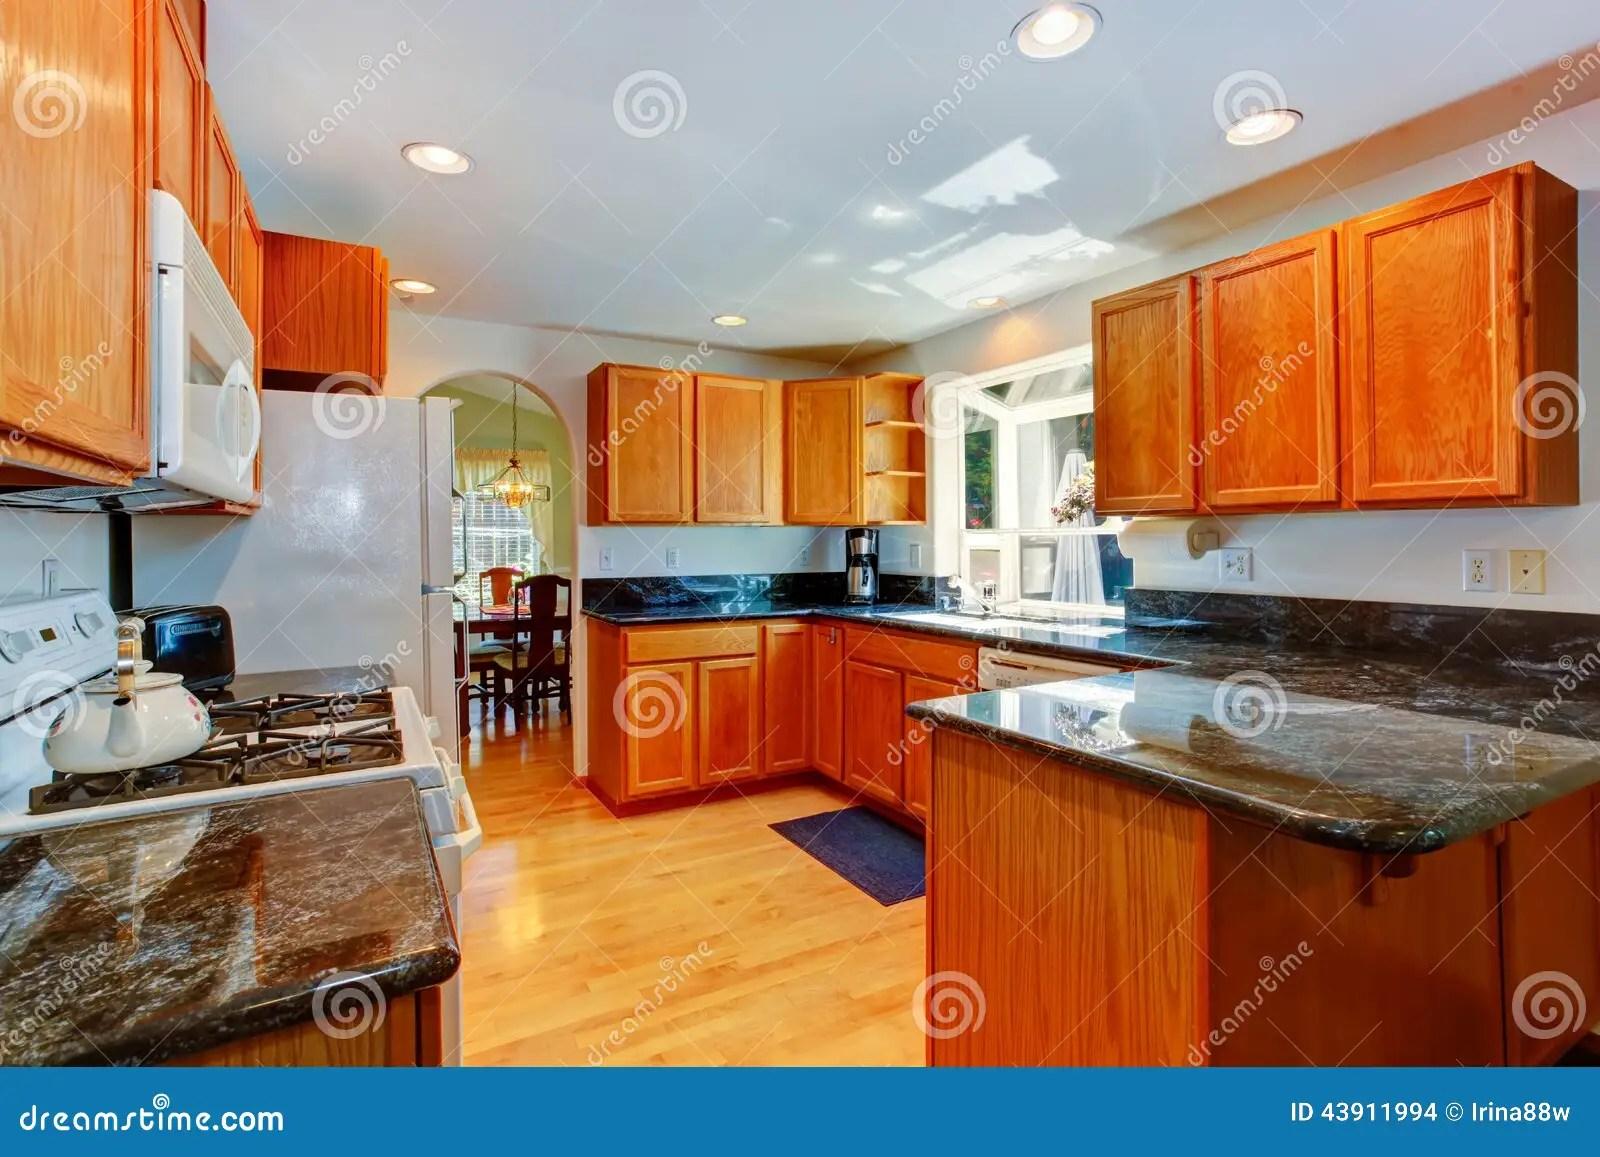 renew kitchen cabinets cabnets 有黑花岗岩上面的厨柜库存照片 图片包括有投反对票 视窗 房子 计数器 有木内阁和黑花岗岩上面的厨房室